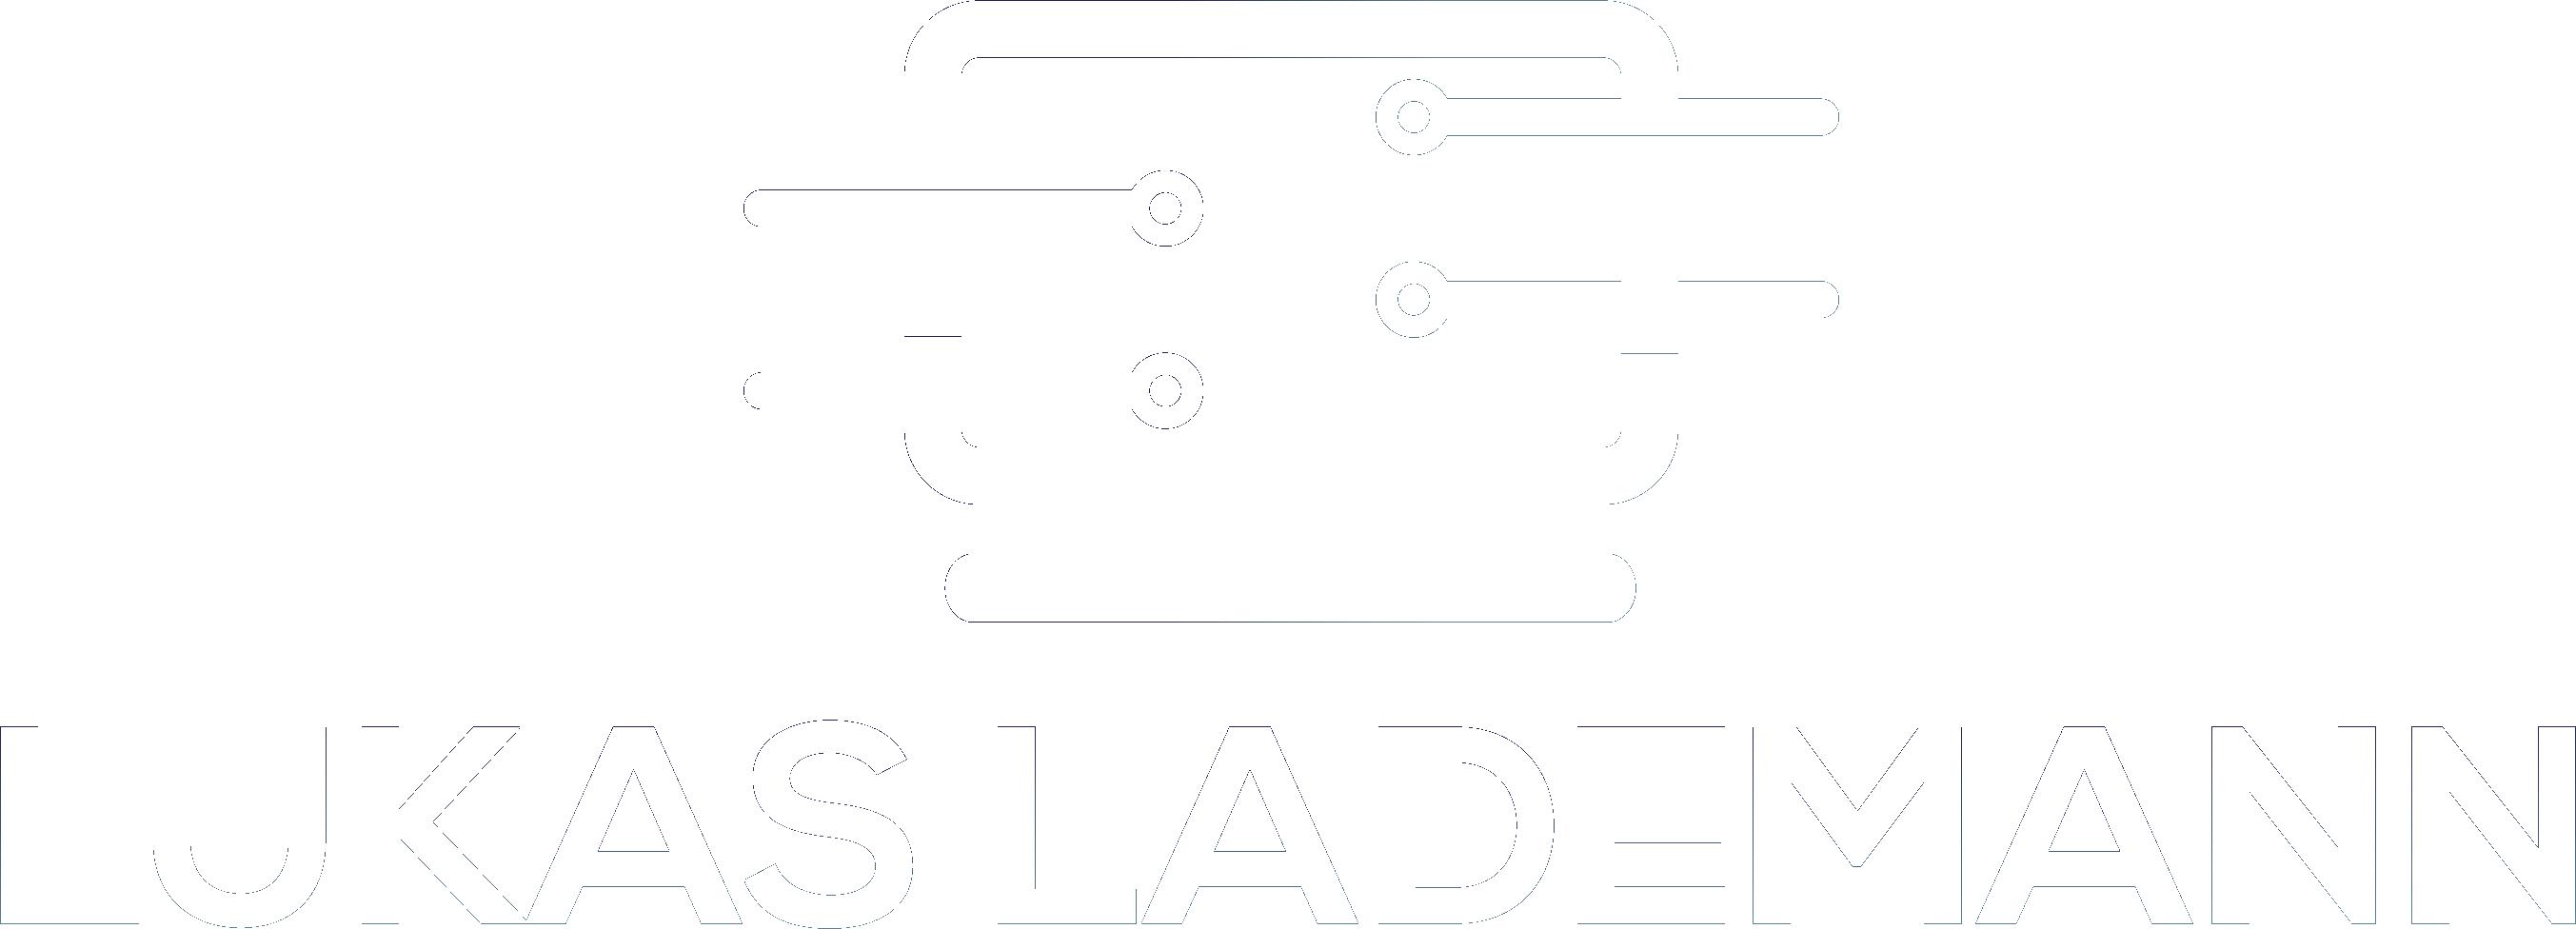 Lukas Lademann